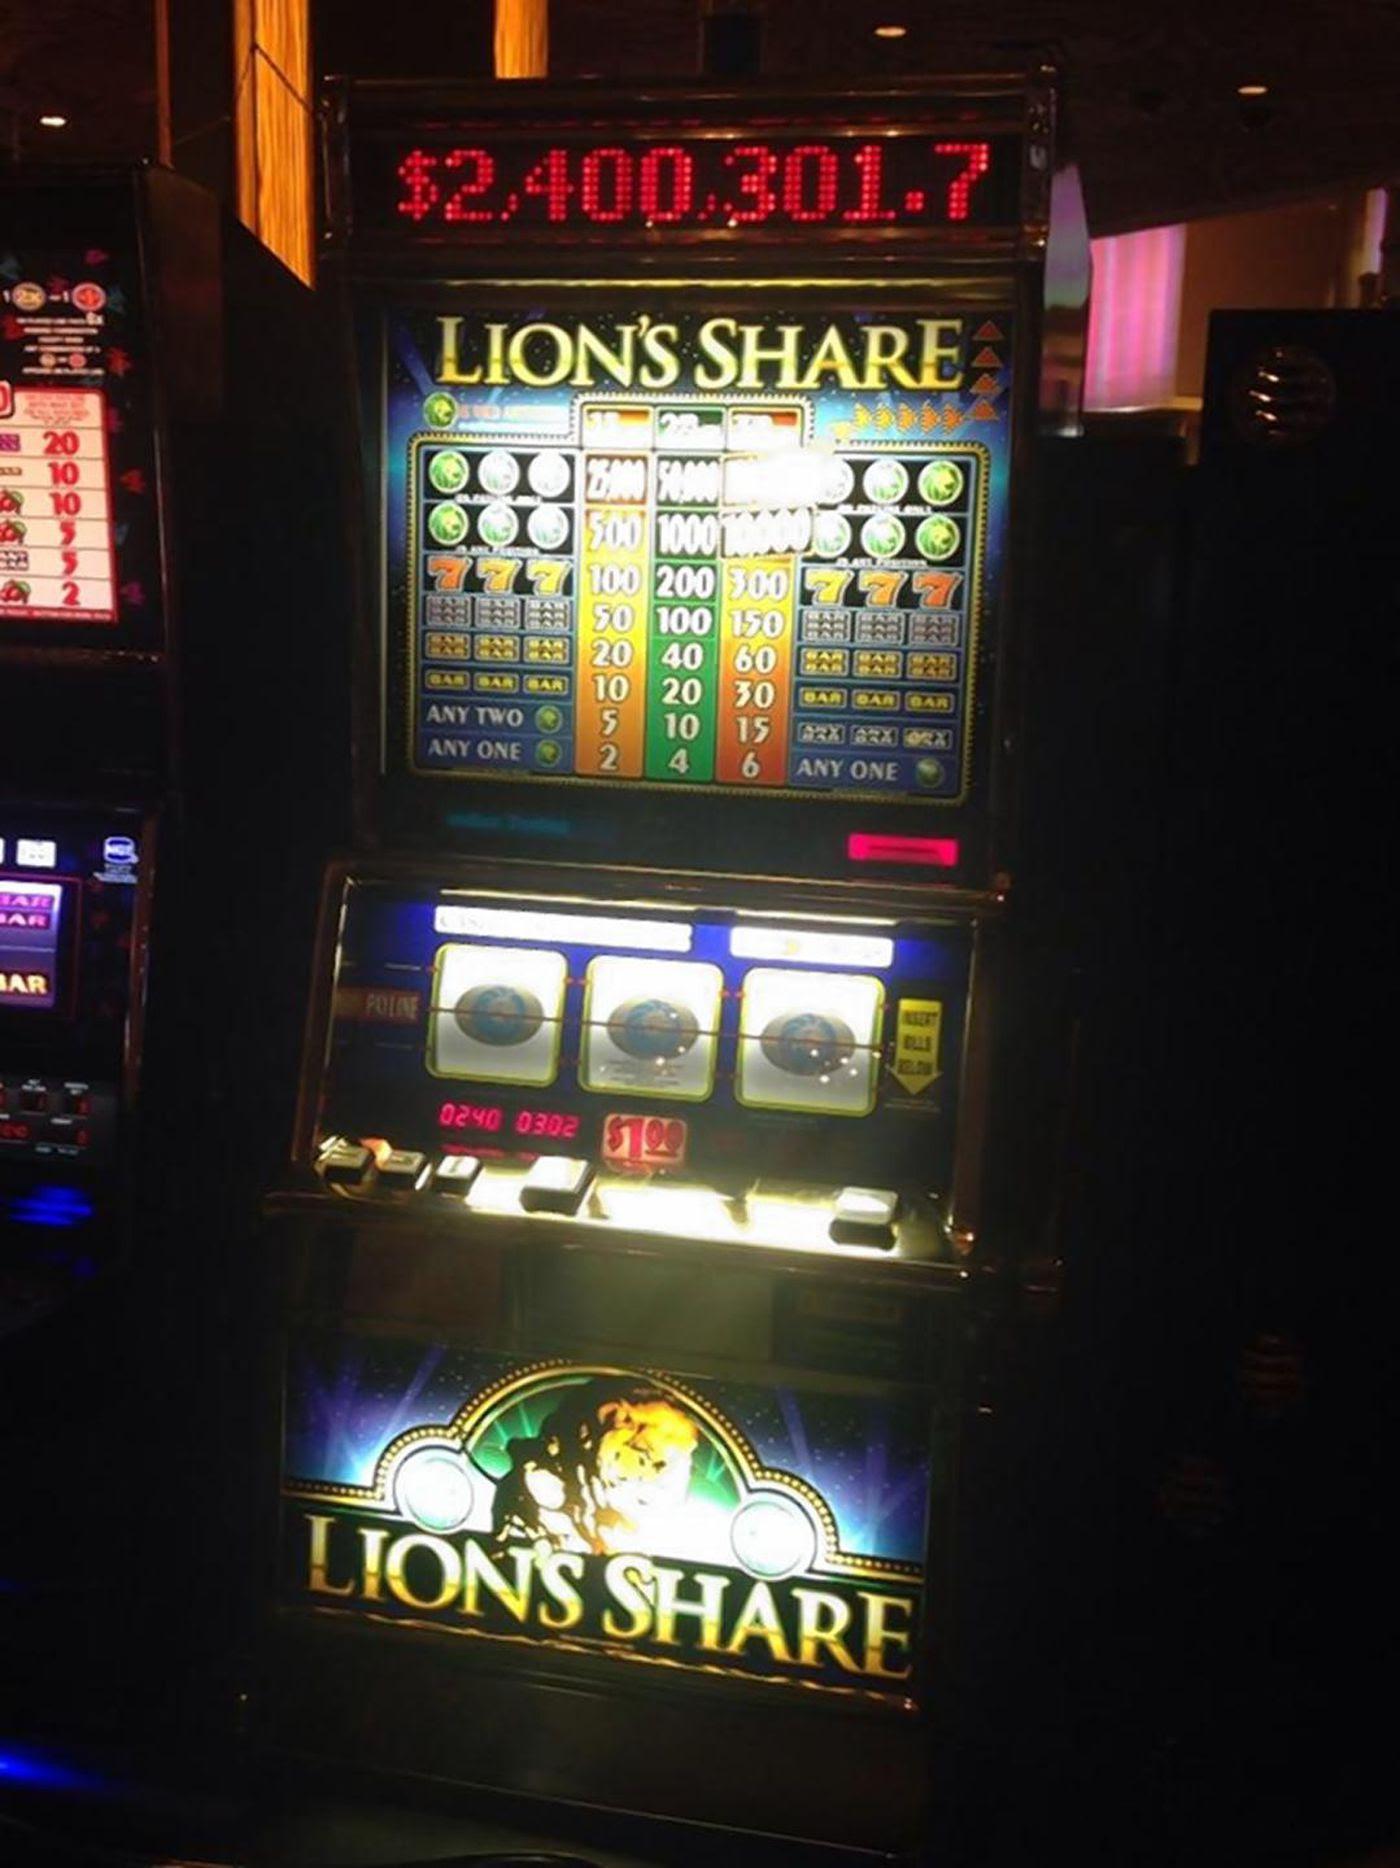 7/21/ · Visitor wins more than $, on slot machine at Las Vegas airport.by CODY MILLER, KSNV.Tuesday, July 21st (Photo: KSNV) LAS VEGAS (KSNV) – .